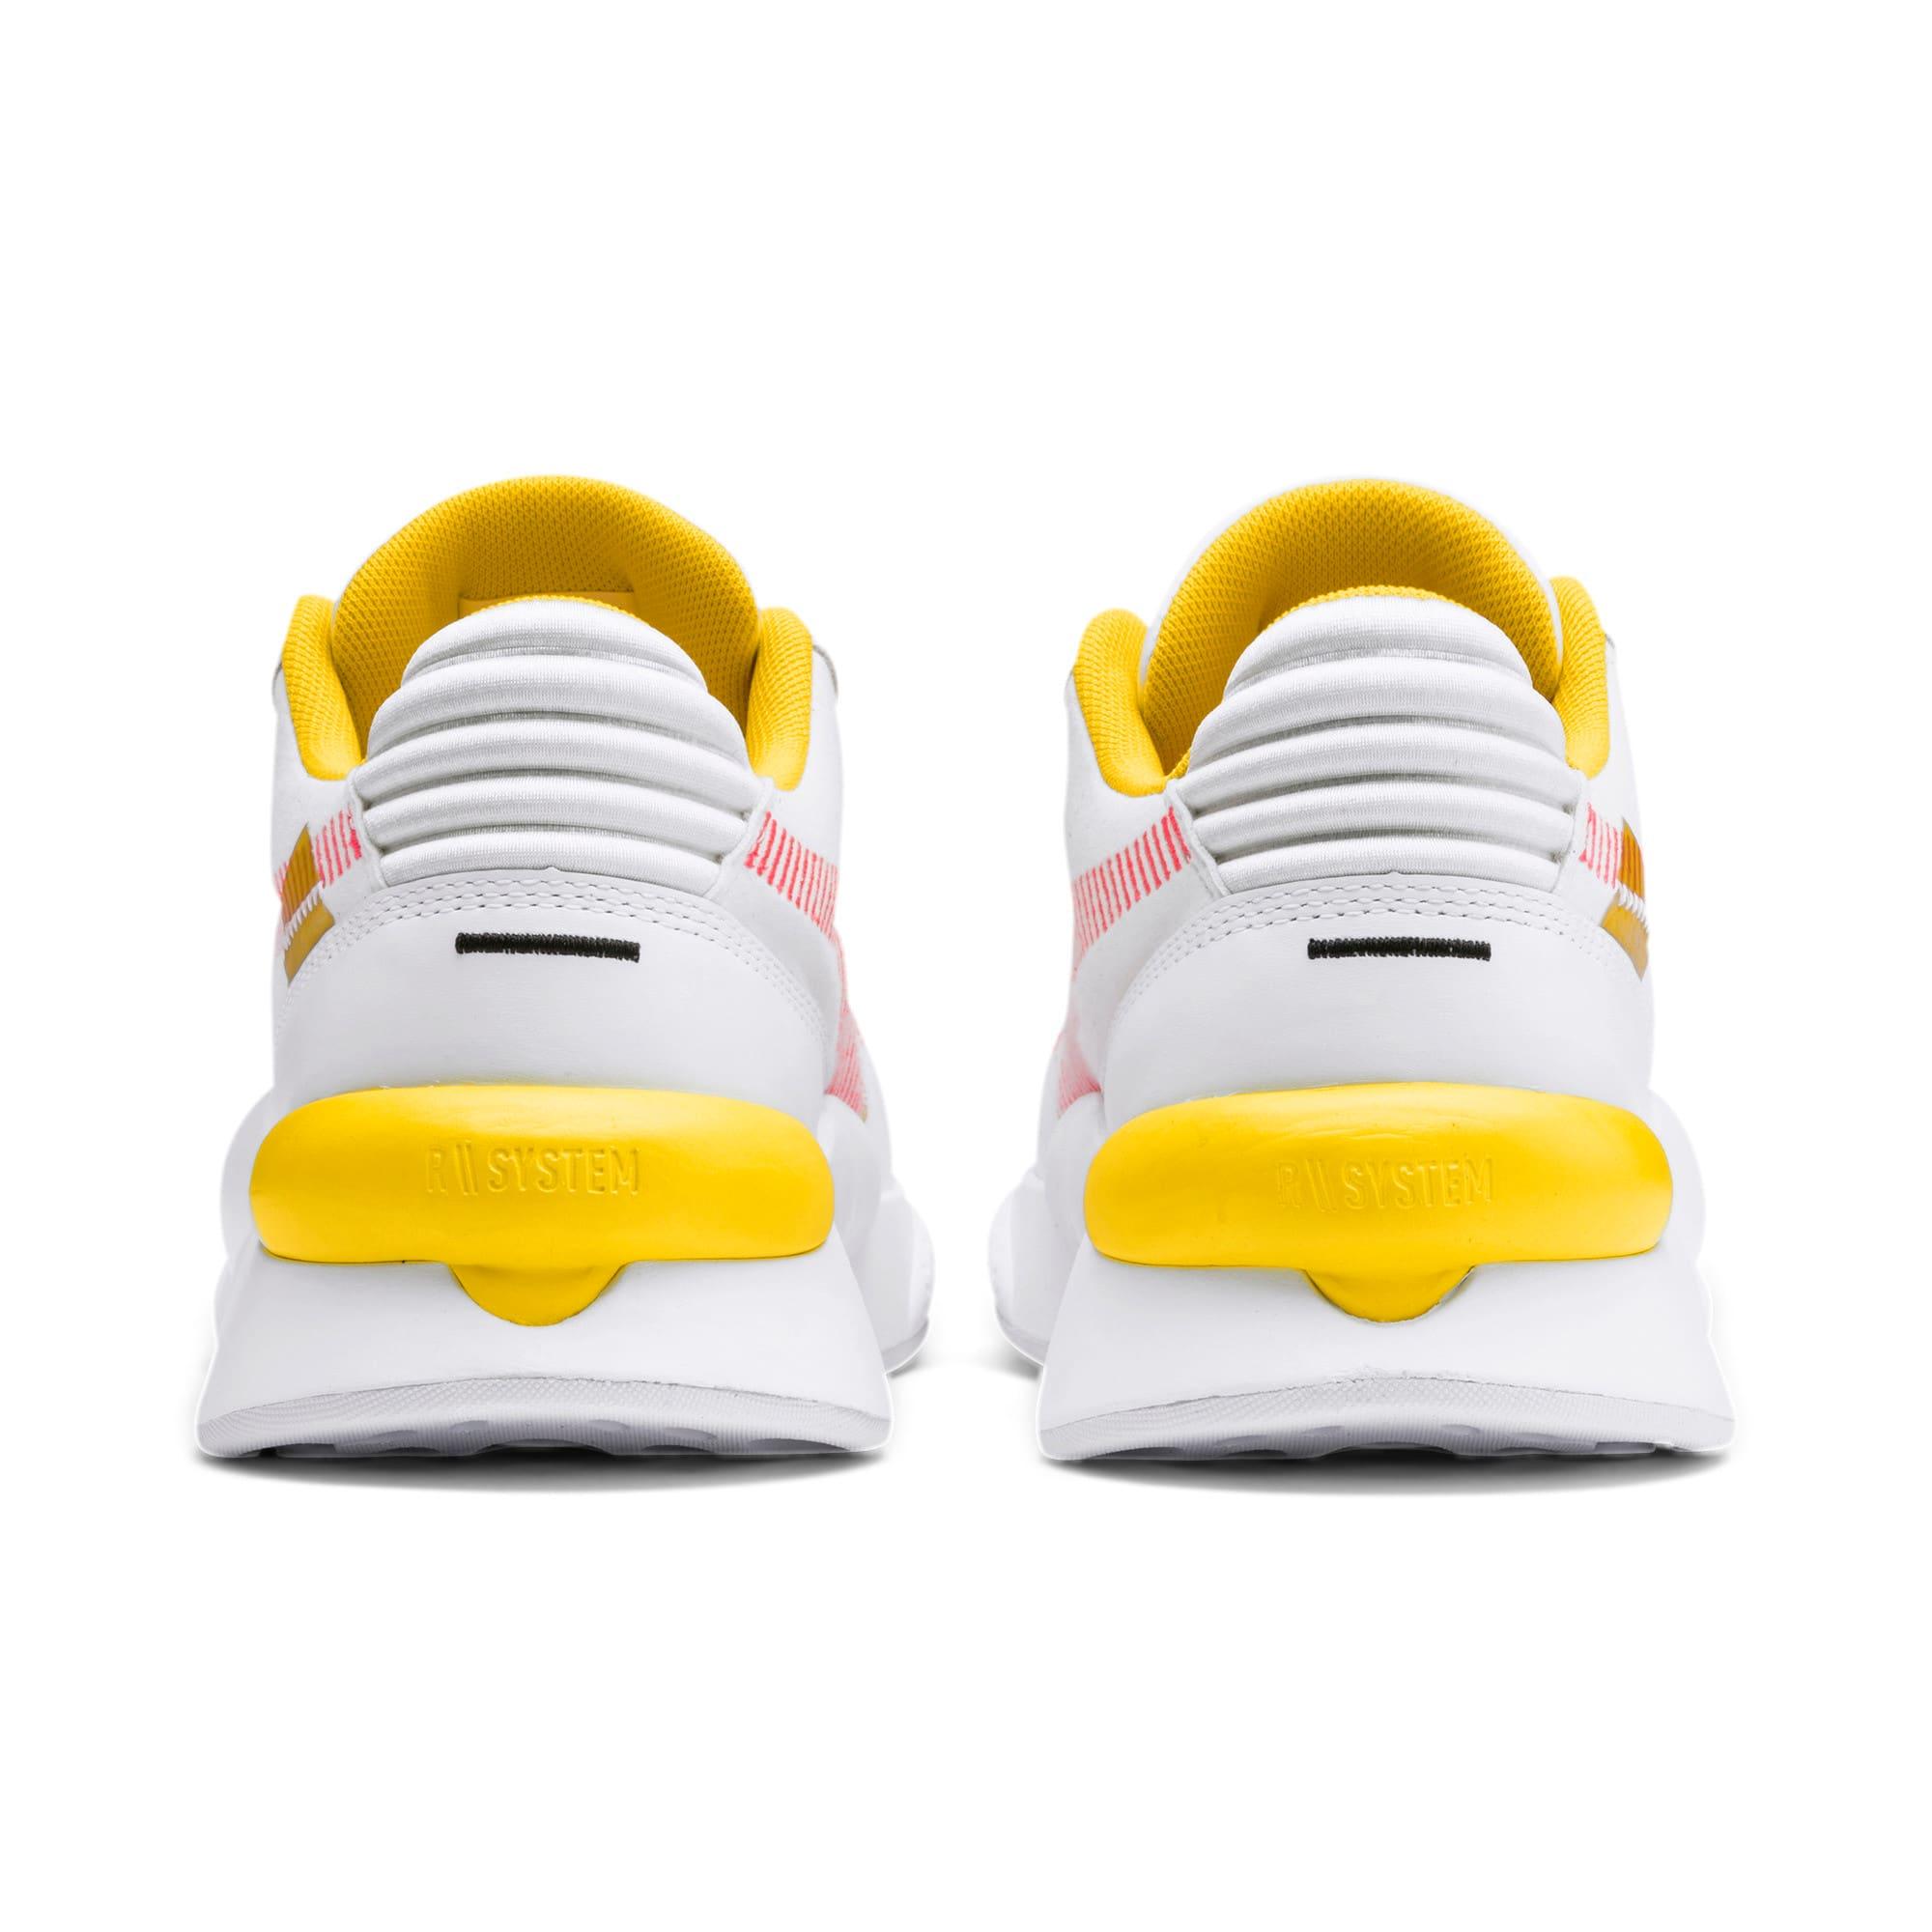 Thumbnail 4 of RS 9.8 Proto Women's Sneakers, Puma White, medium